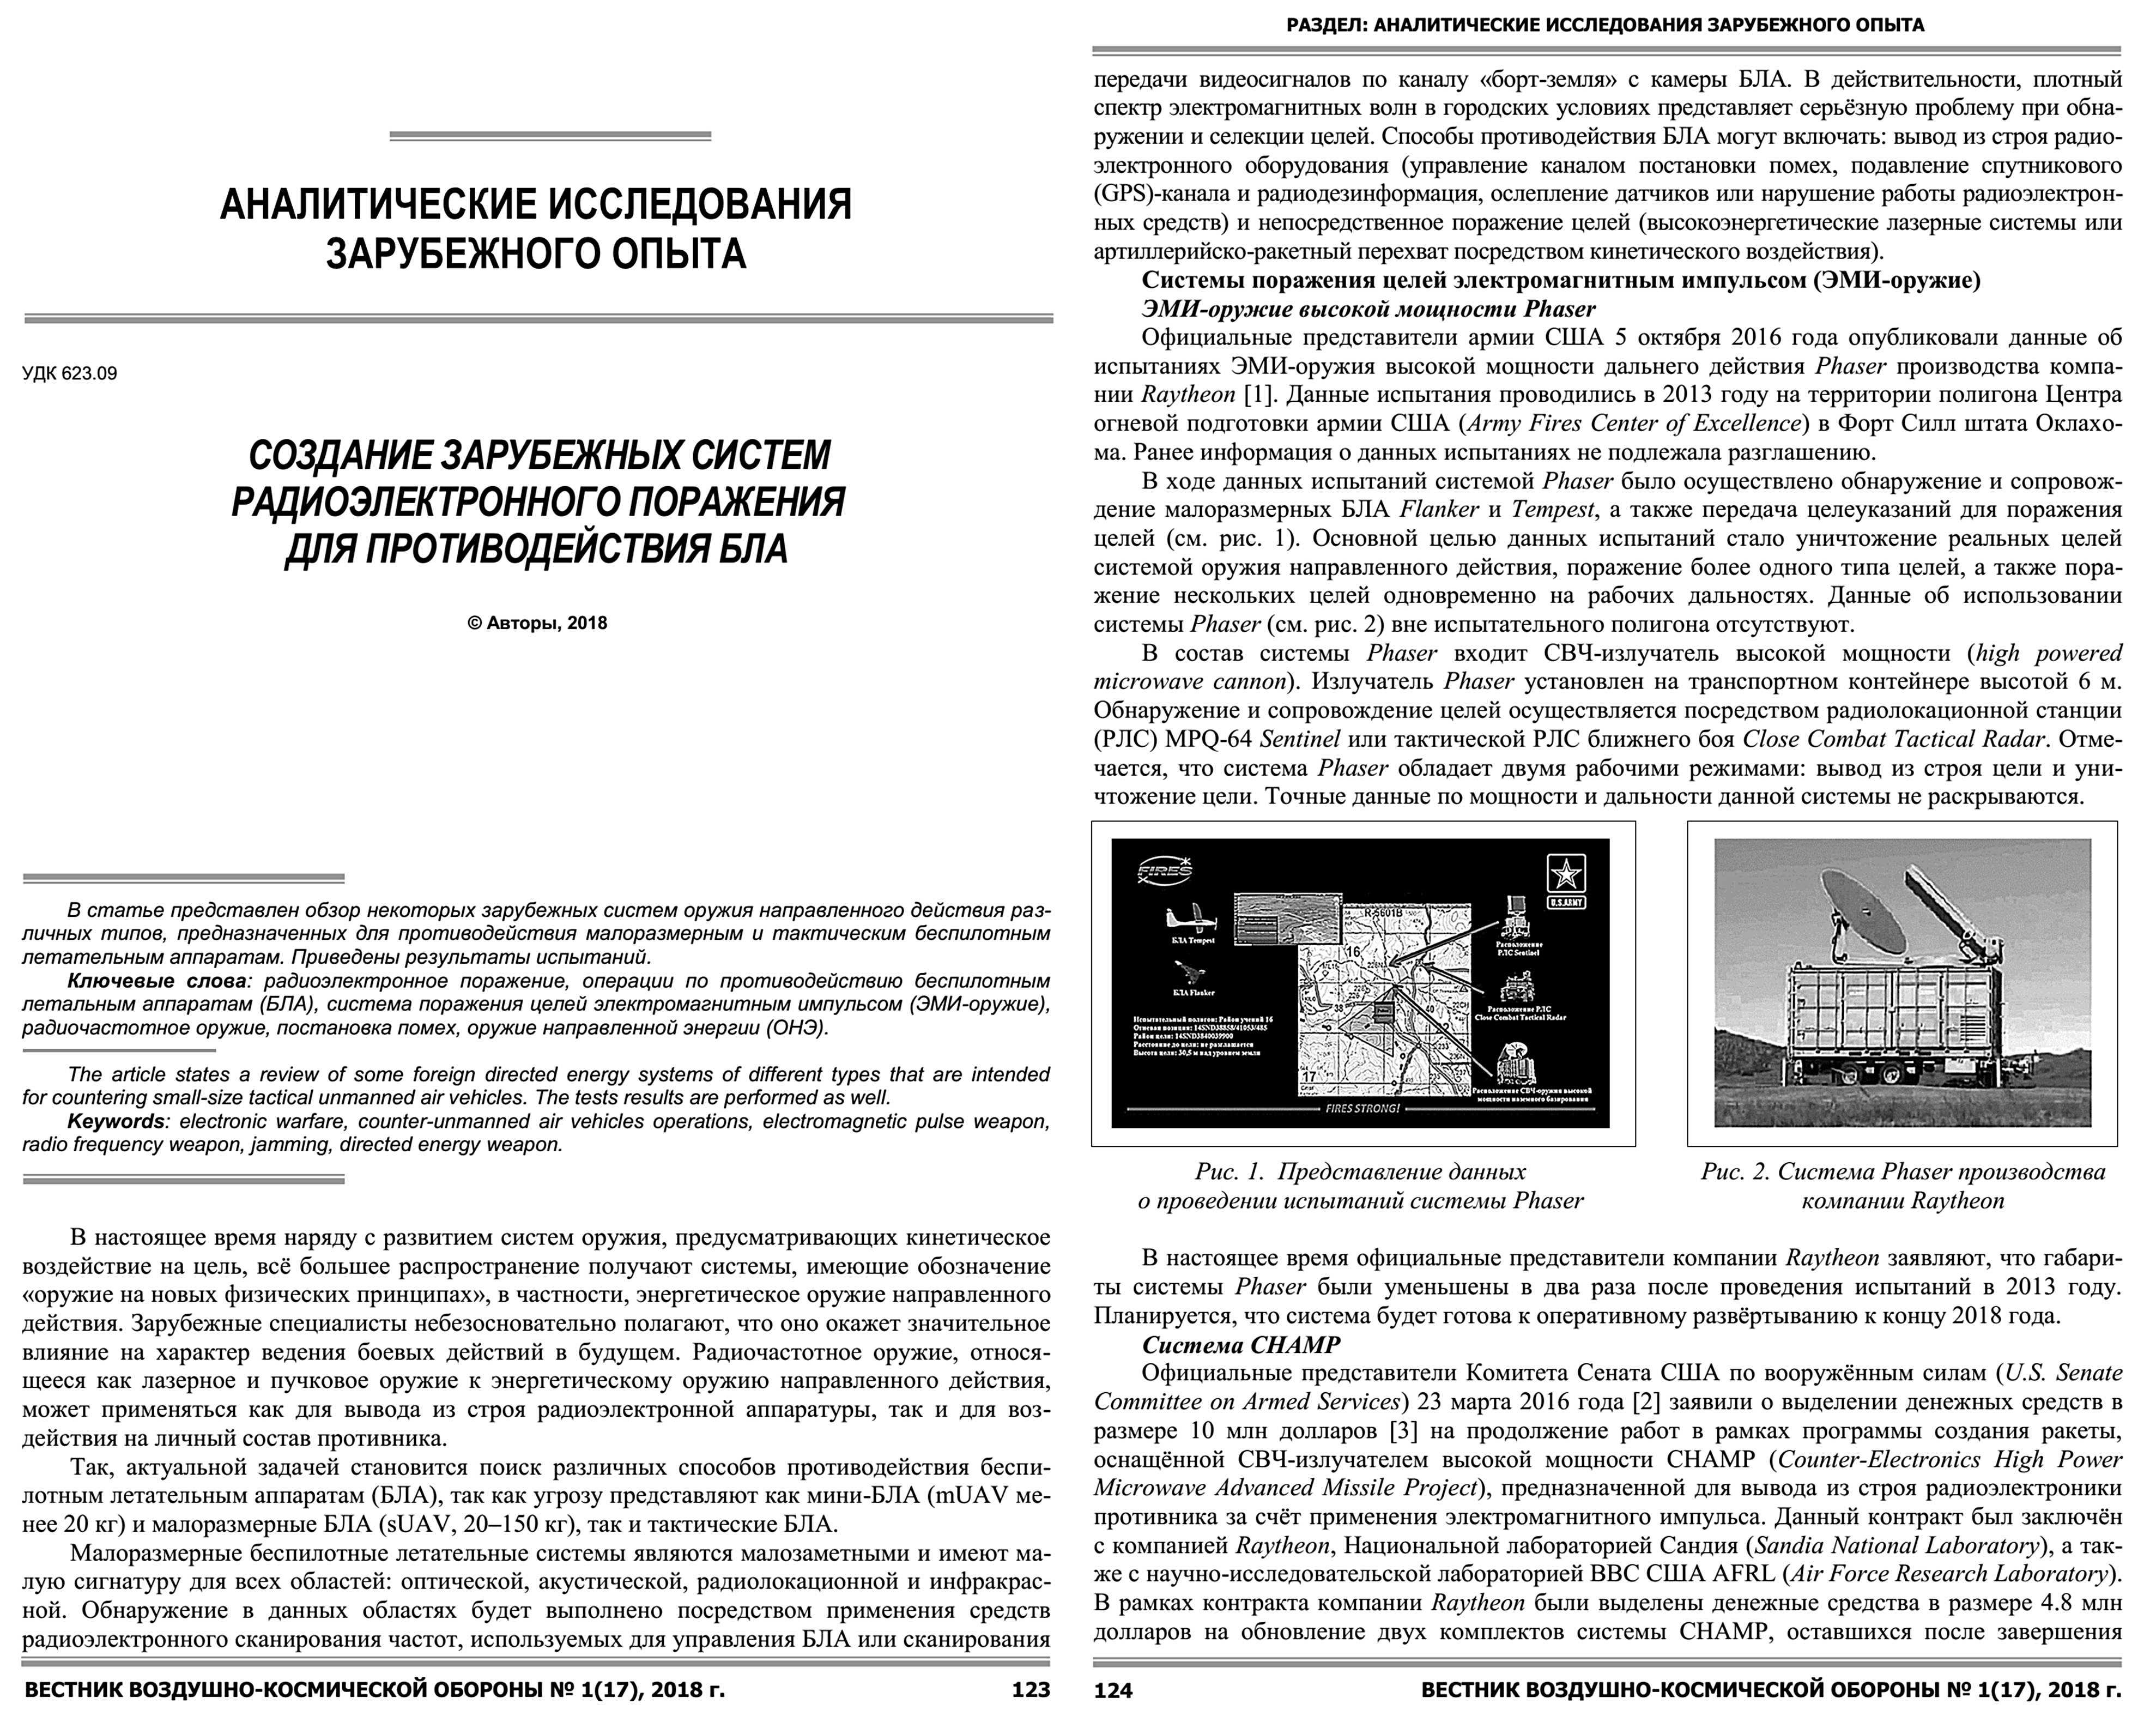 http://s3.uploads.ru/T20ub.jpg